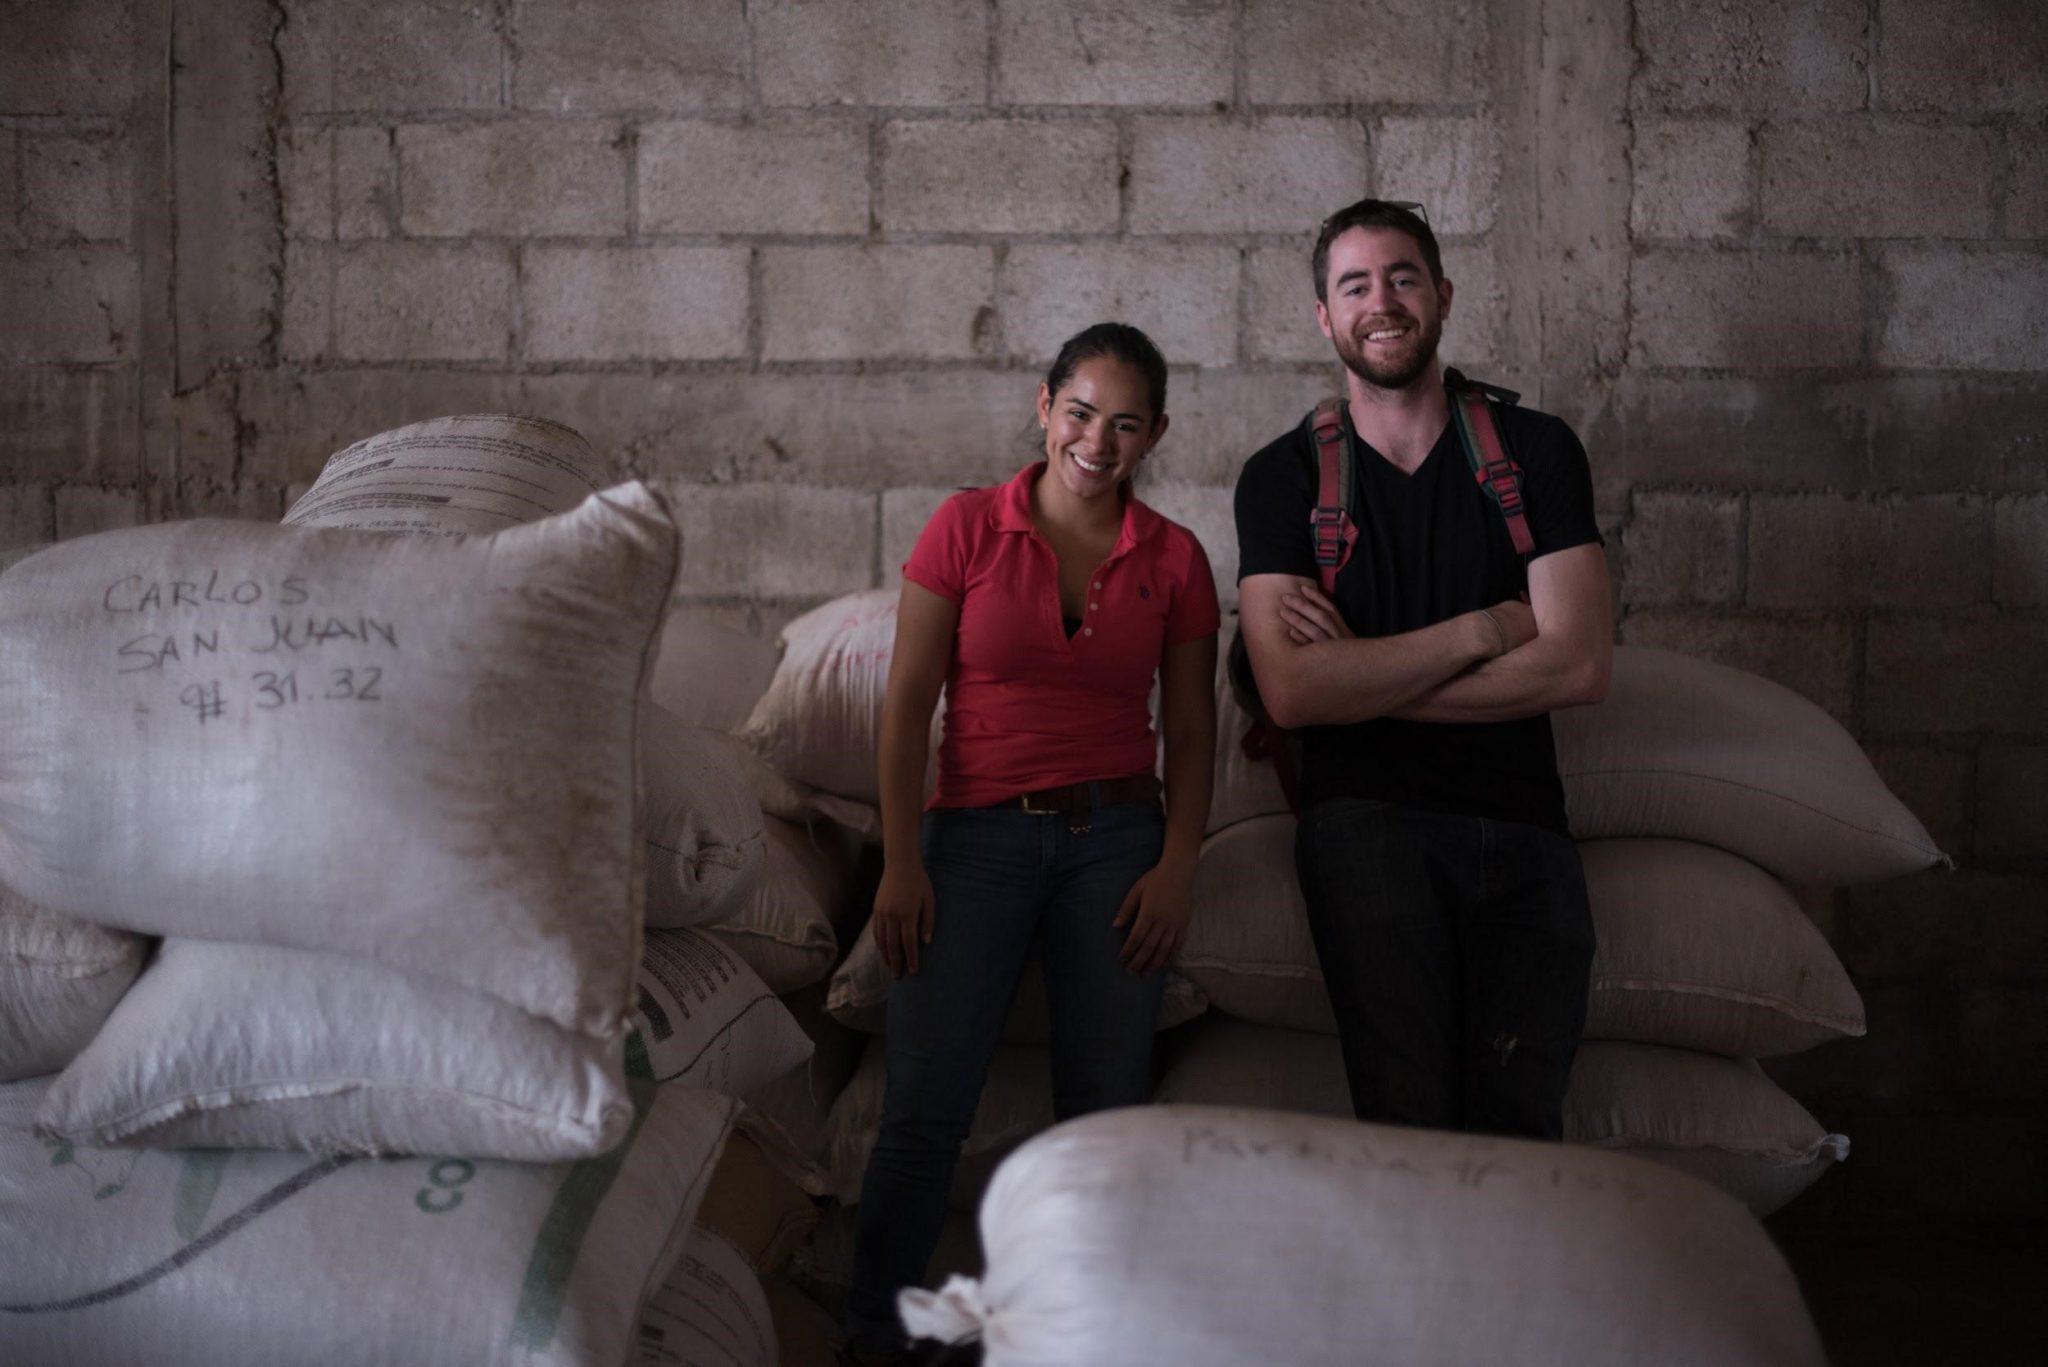 productores junto a sacos de cafe